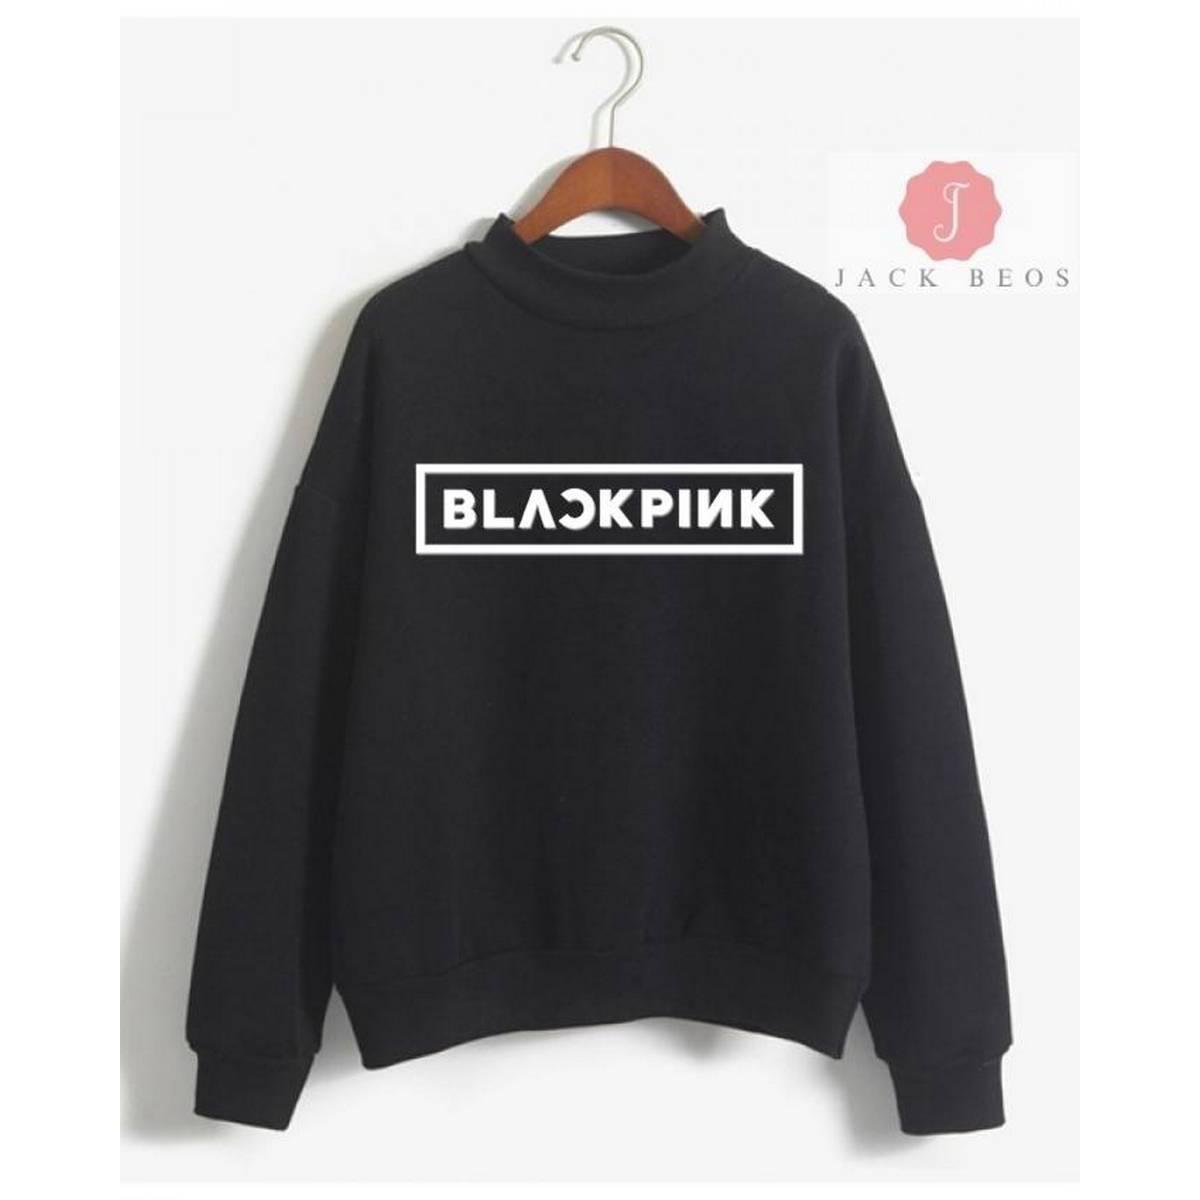 Blackpink Fleece Sweatshirt For Women All Color Available  - 271020191